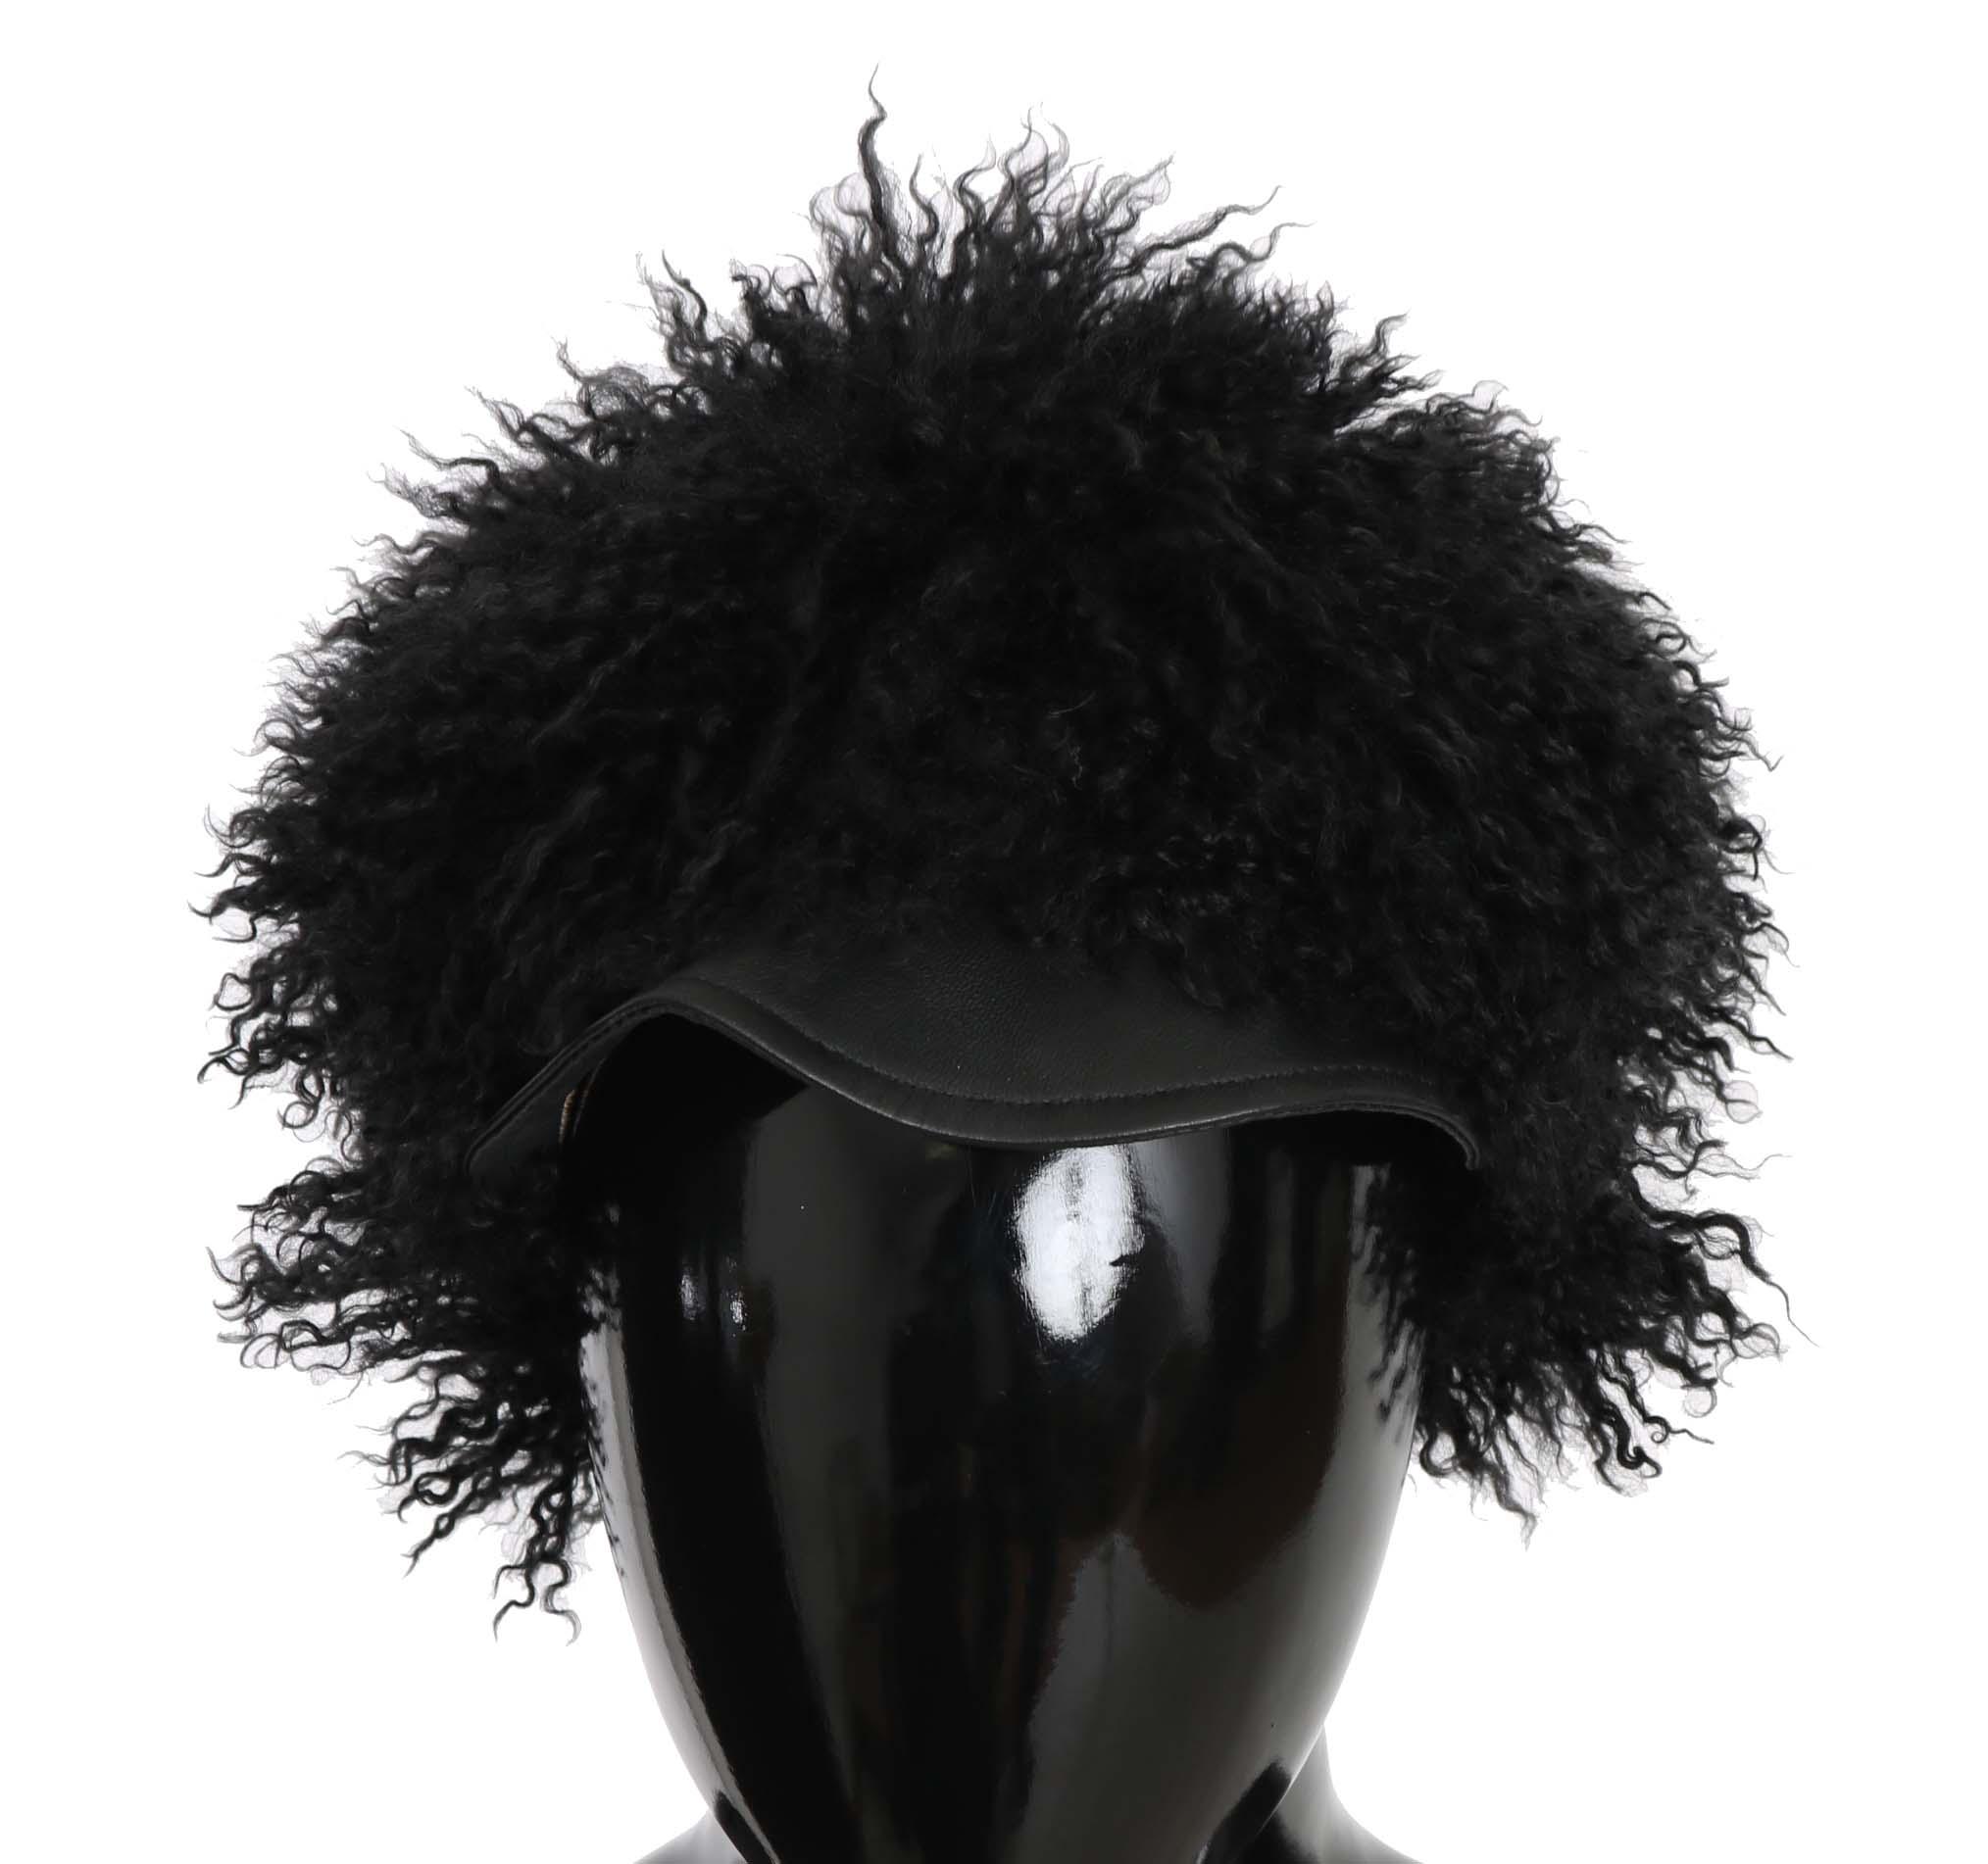 Dolce & Gabbana Women's Tibet Lamb Fur Leather Gatsby Hat Black HAT70216 - 56 cm XS